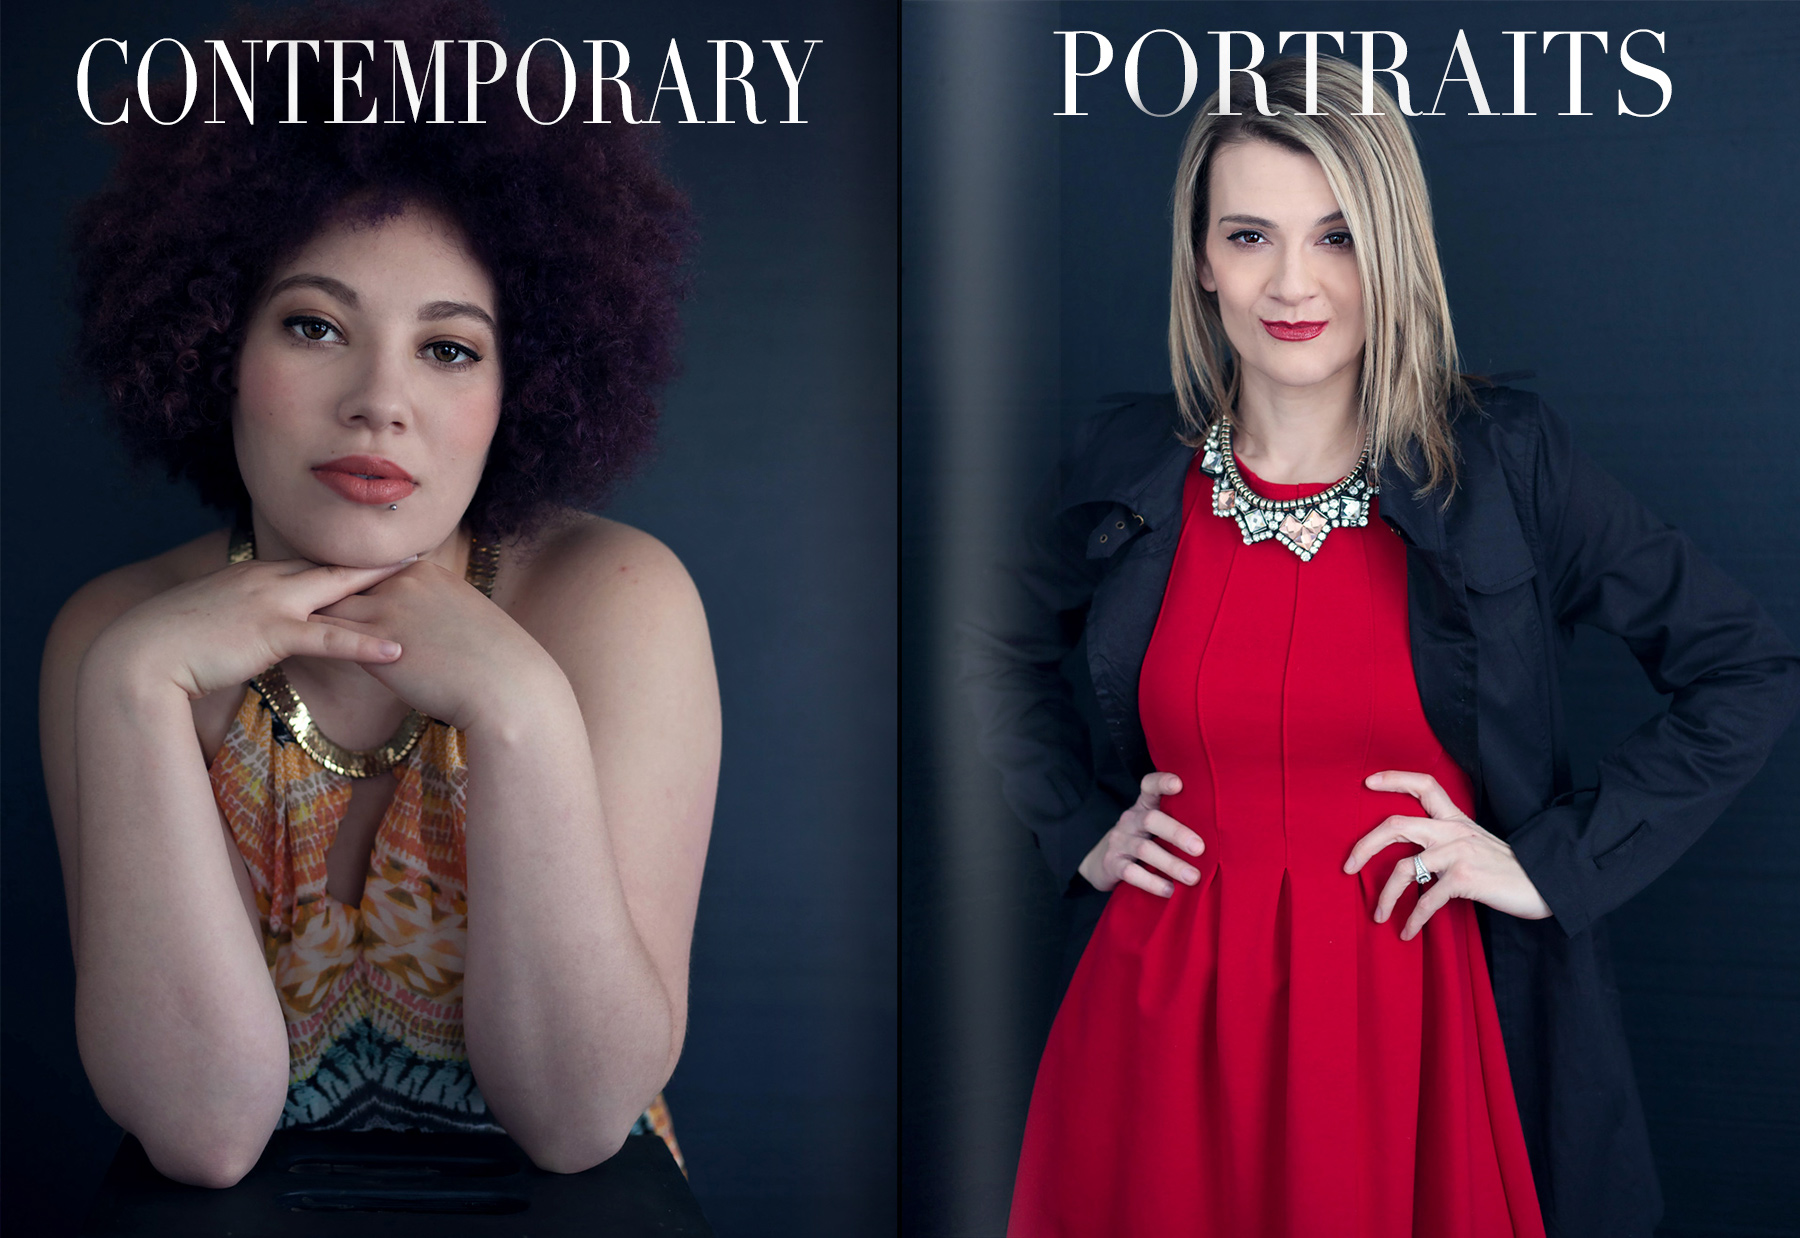 Makeup & Photography: Blanc Sketch Artistry